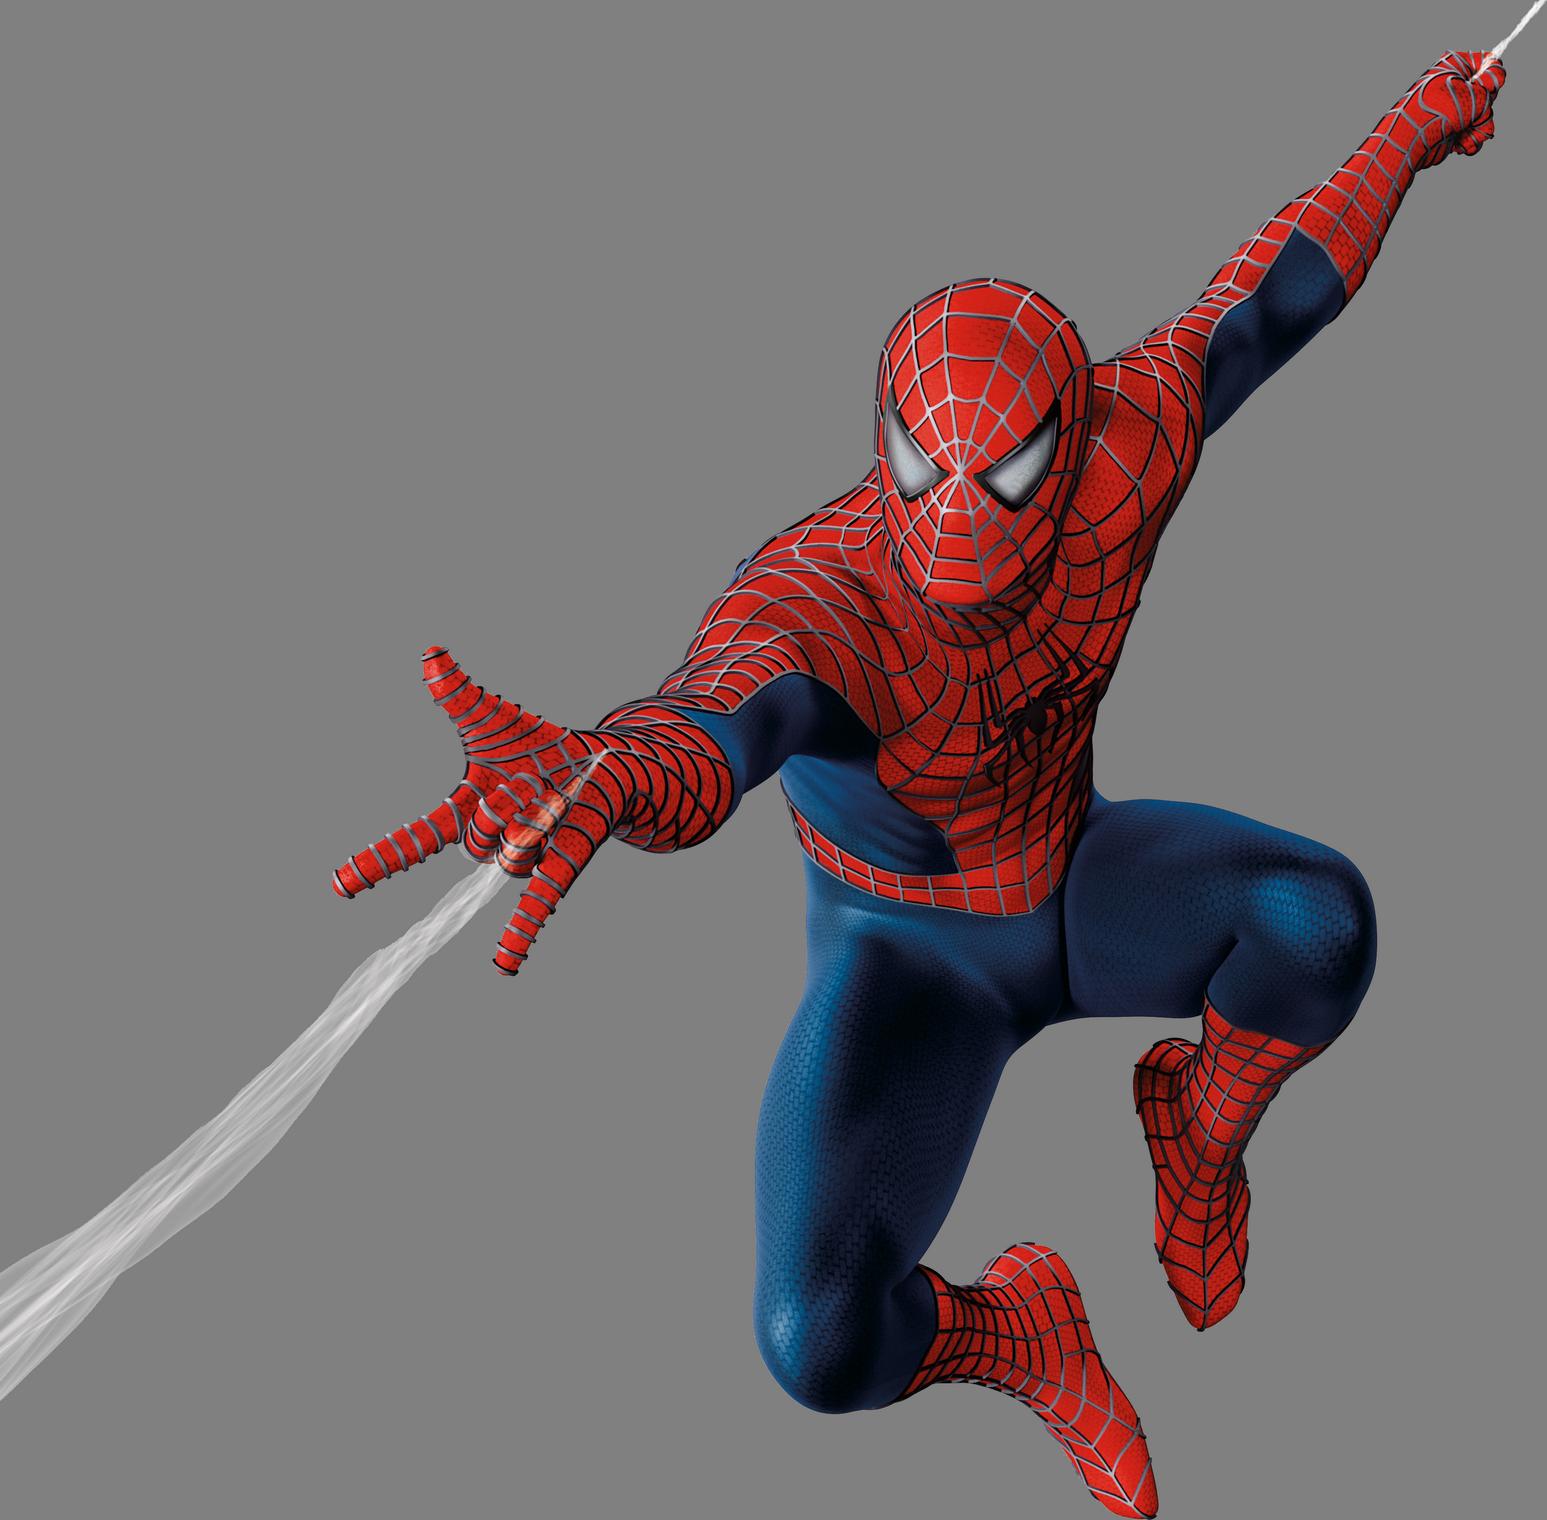 Spiderman Png Image Spiderman Images Spiderman Spiderman Home